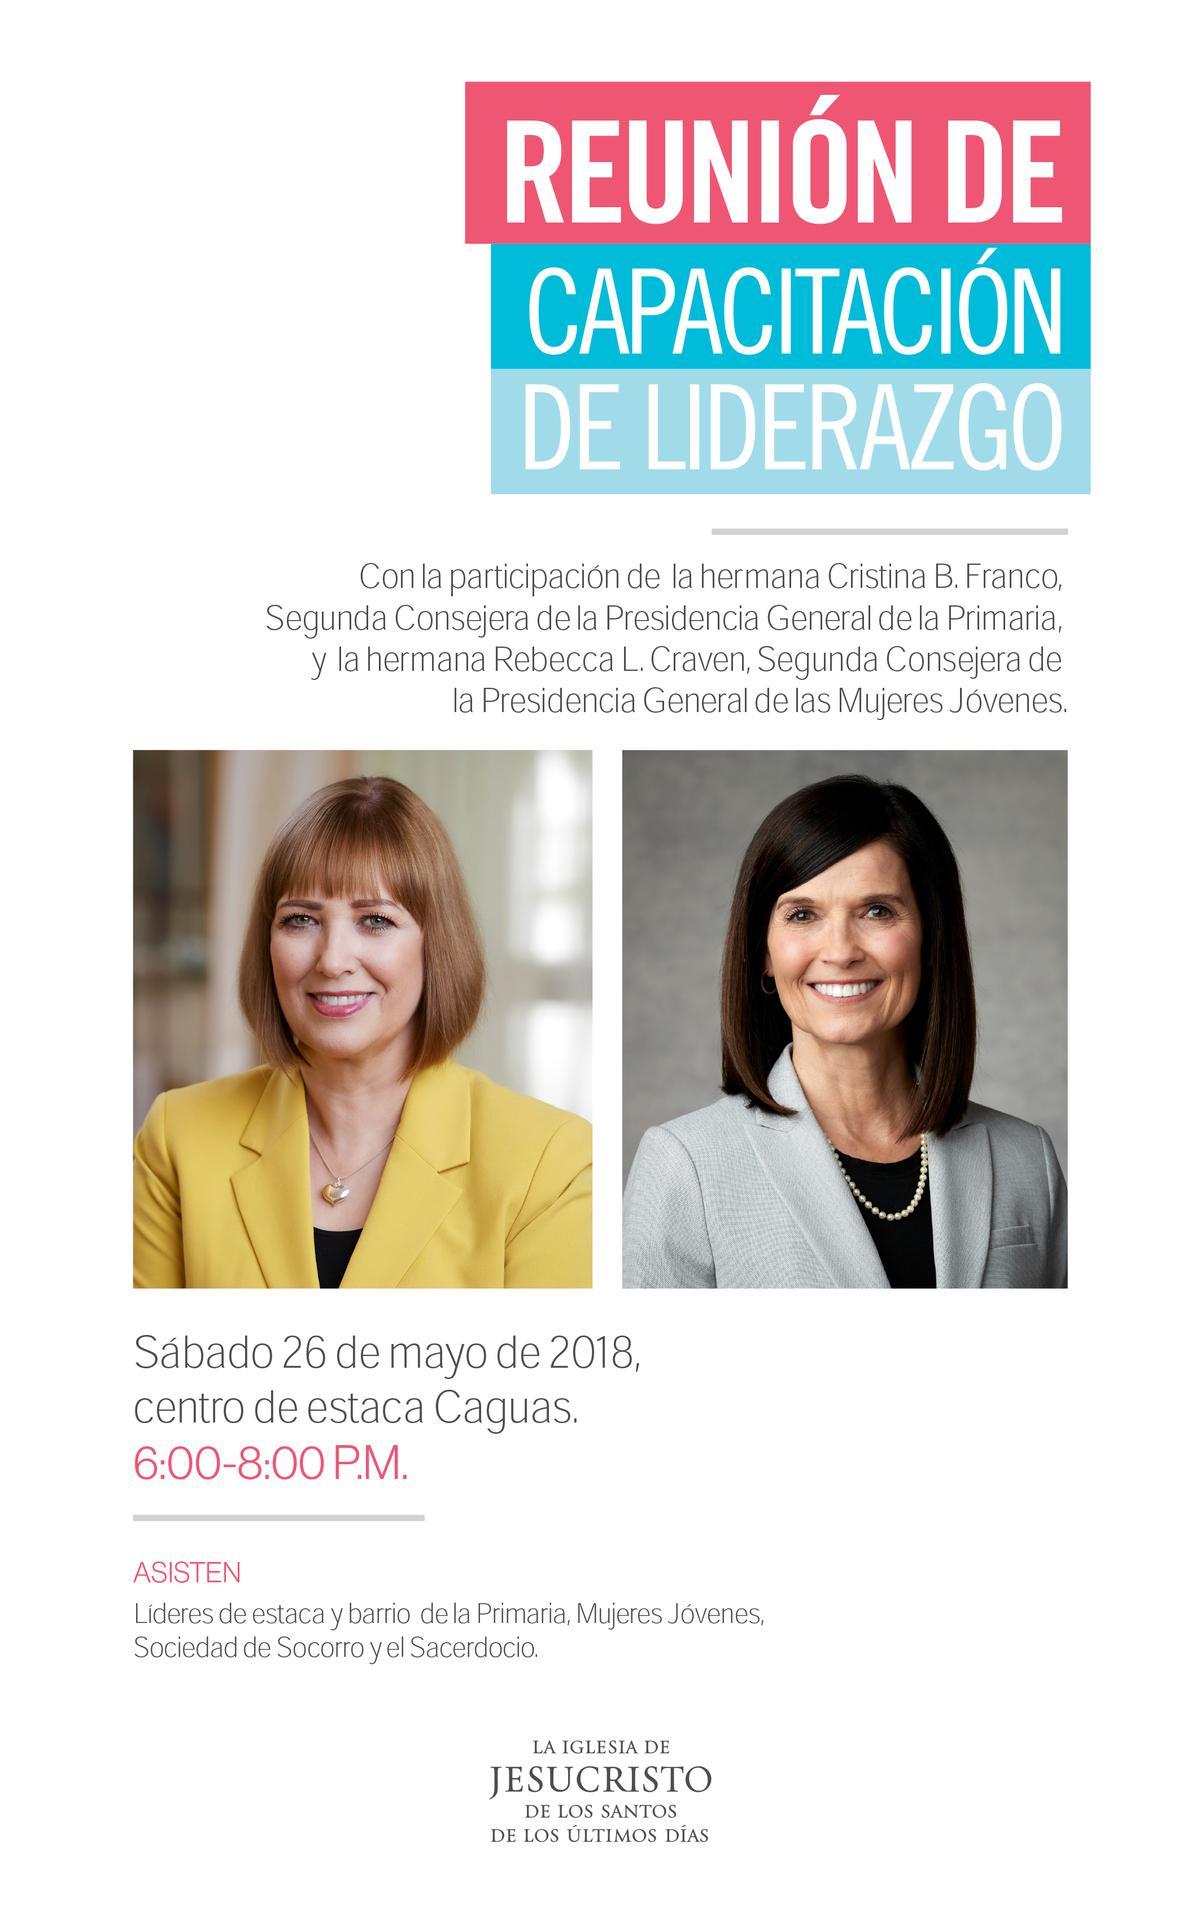 Reunión de Capacitación Liderazgo en Puerto Rico